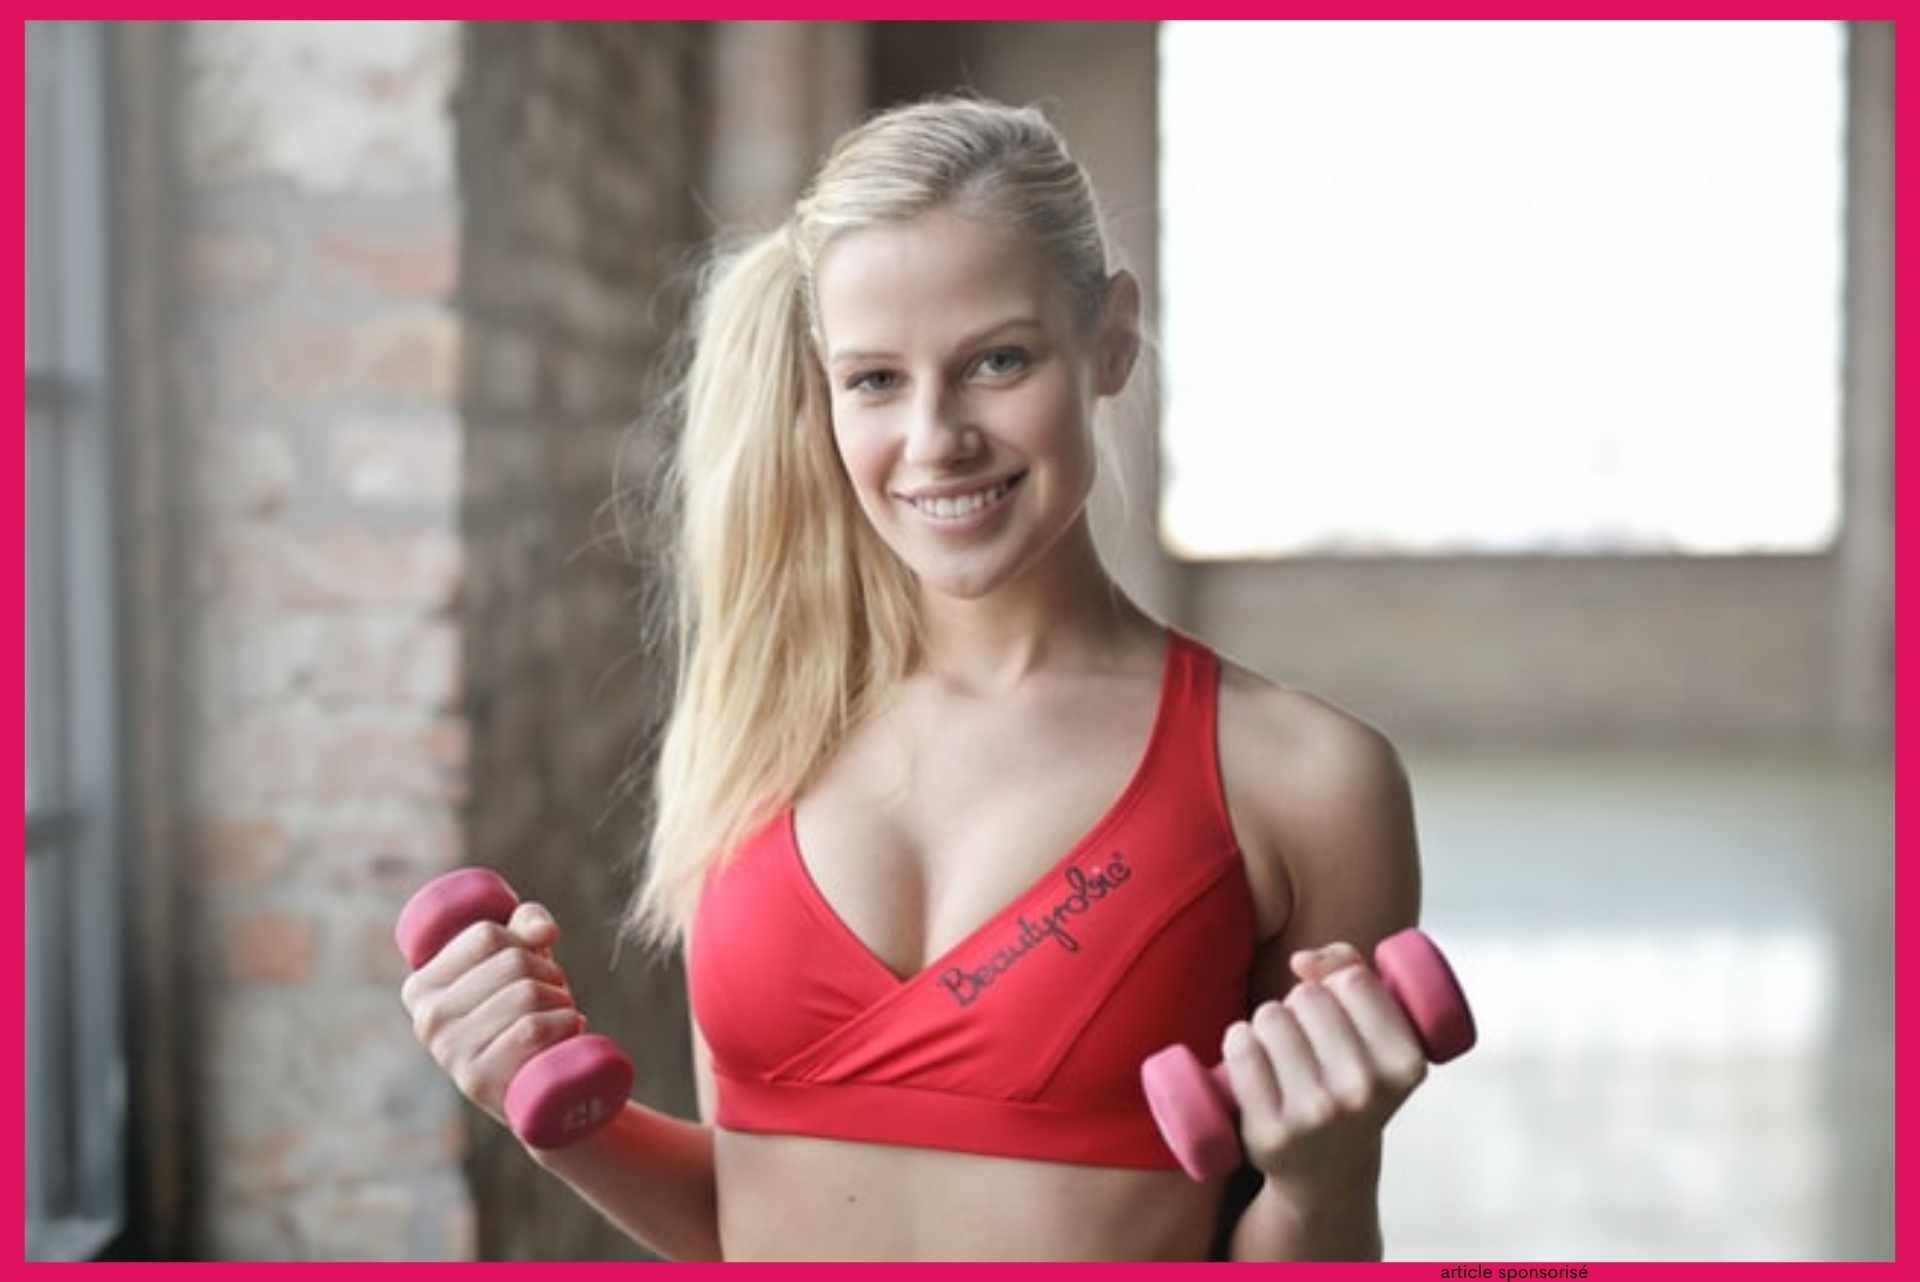 Femmes et musculation